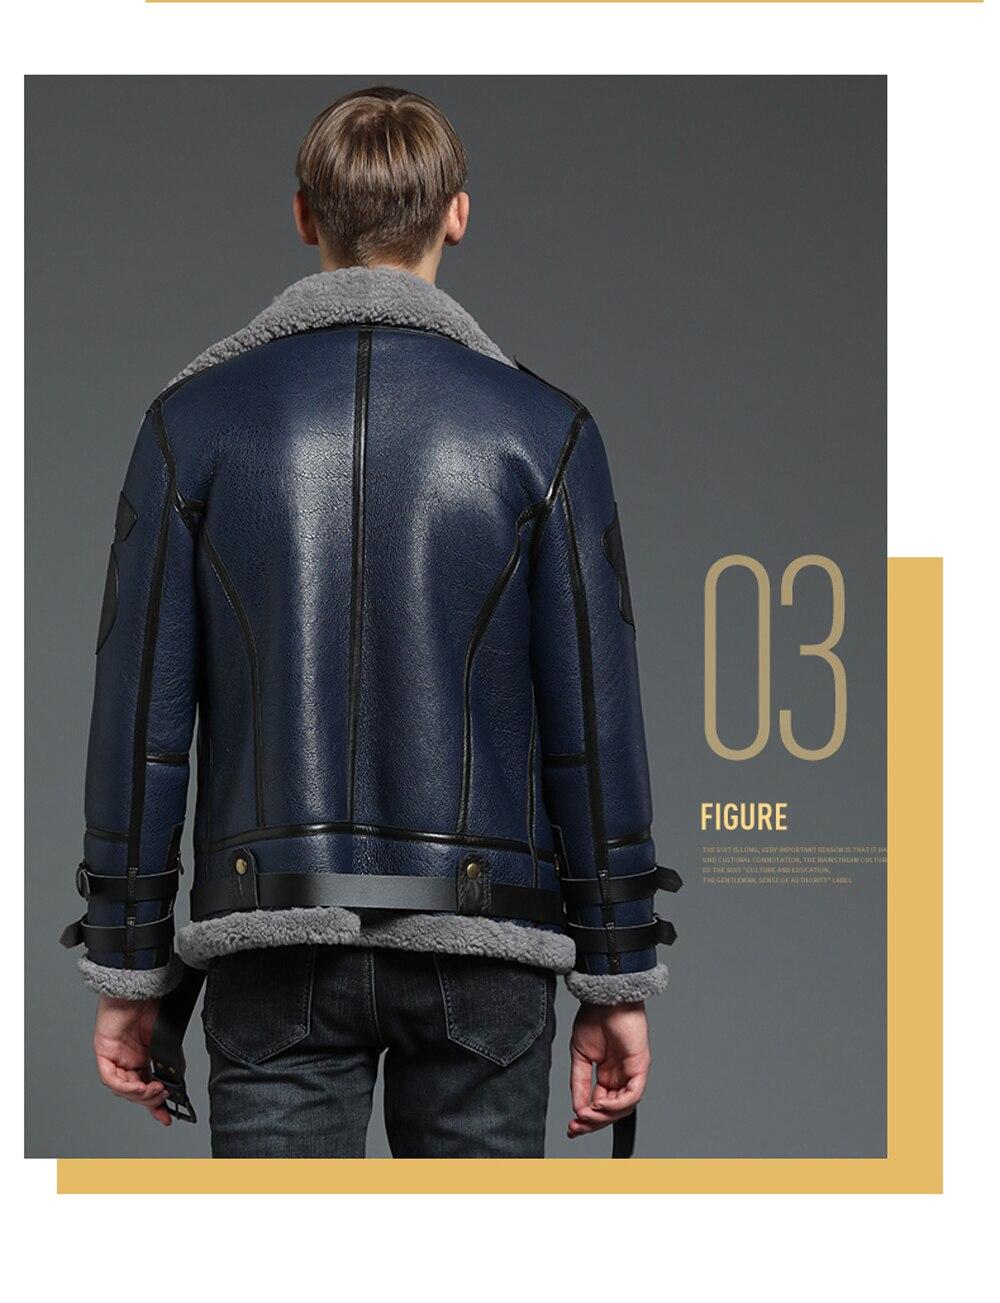 HTB1ufNeXp67gK0jSZPfq6yhhFXaY 2019 Fashion 100% Quality Real Sheepskin Fur Men Coat Genuine Full Pelt Sheep Shearling Male Winter Jacket Brown Men Fur Outwear